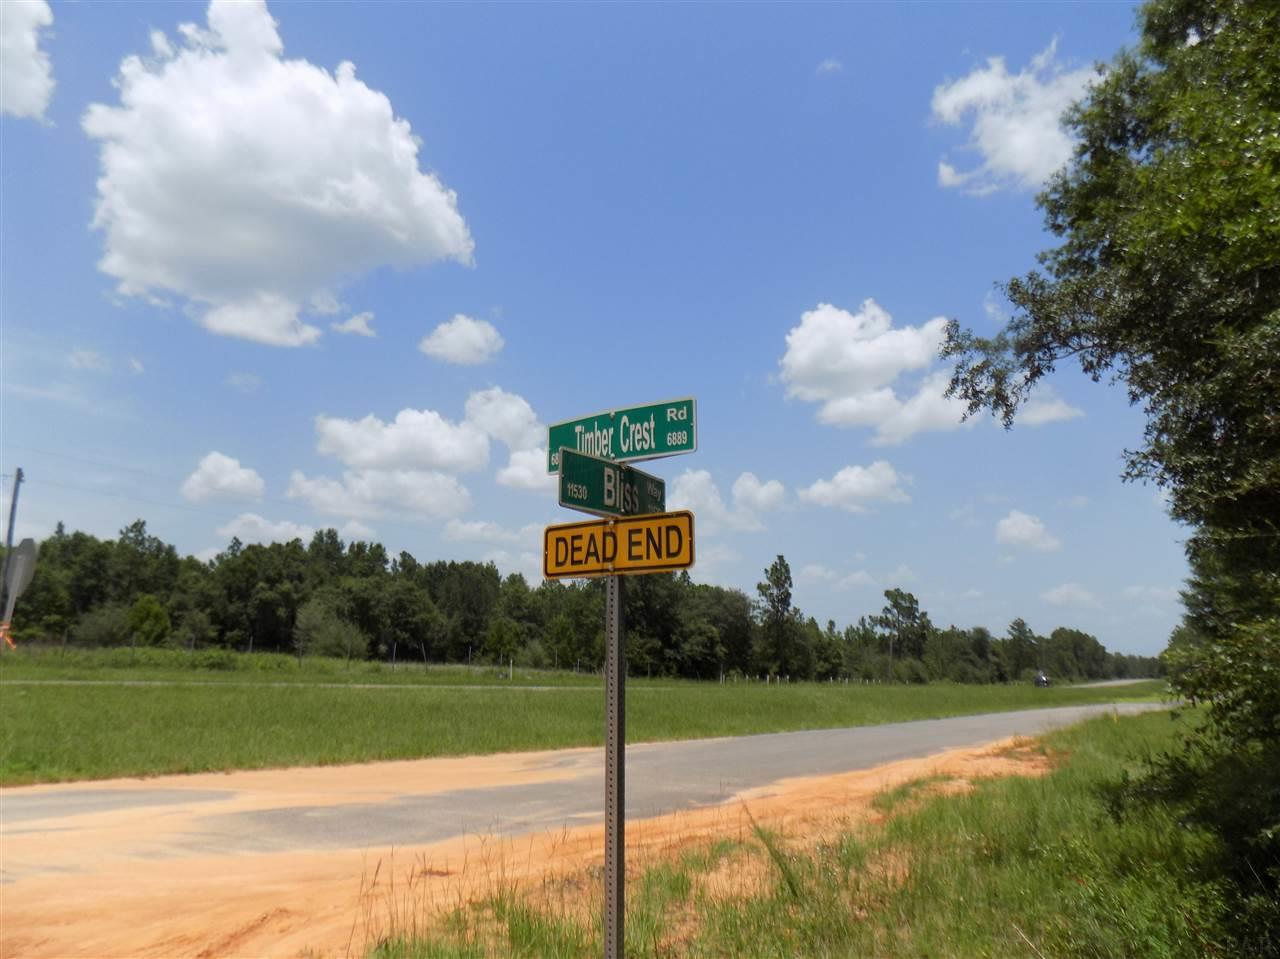 6811 Timber Crest Rd, Milton, FL 32583